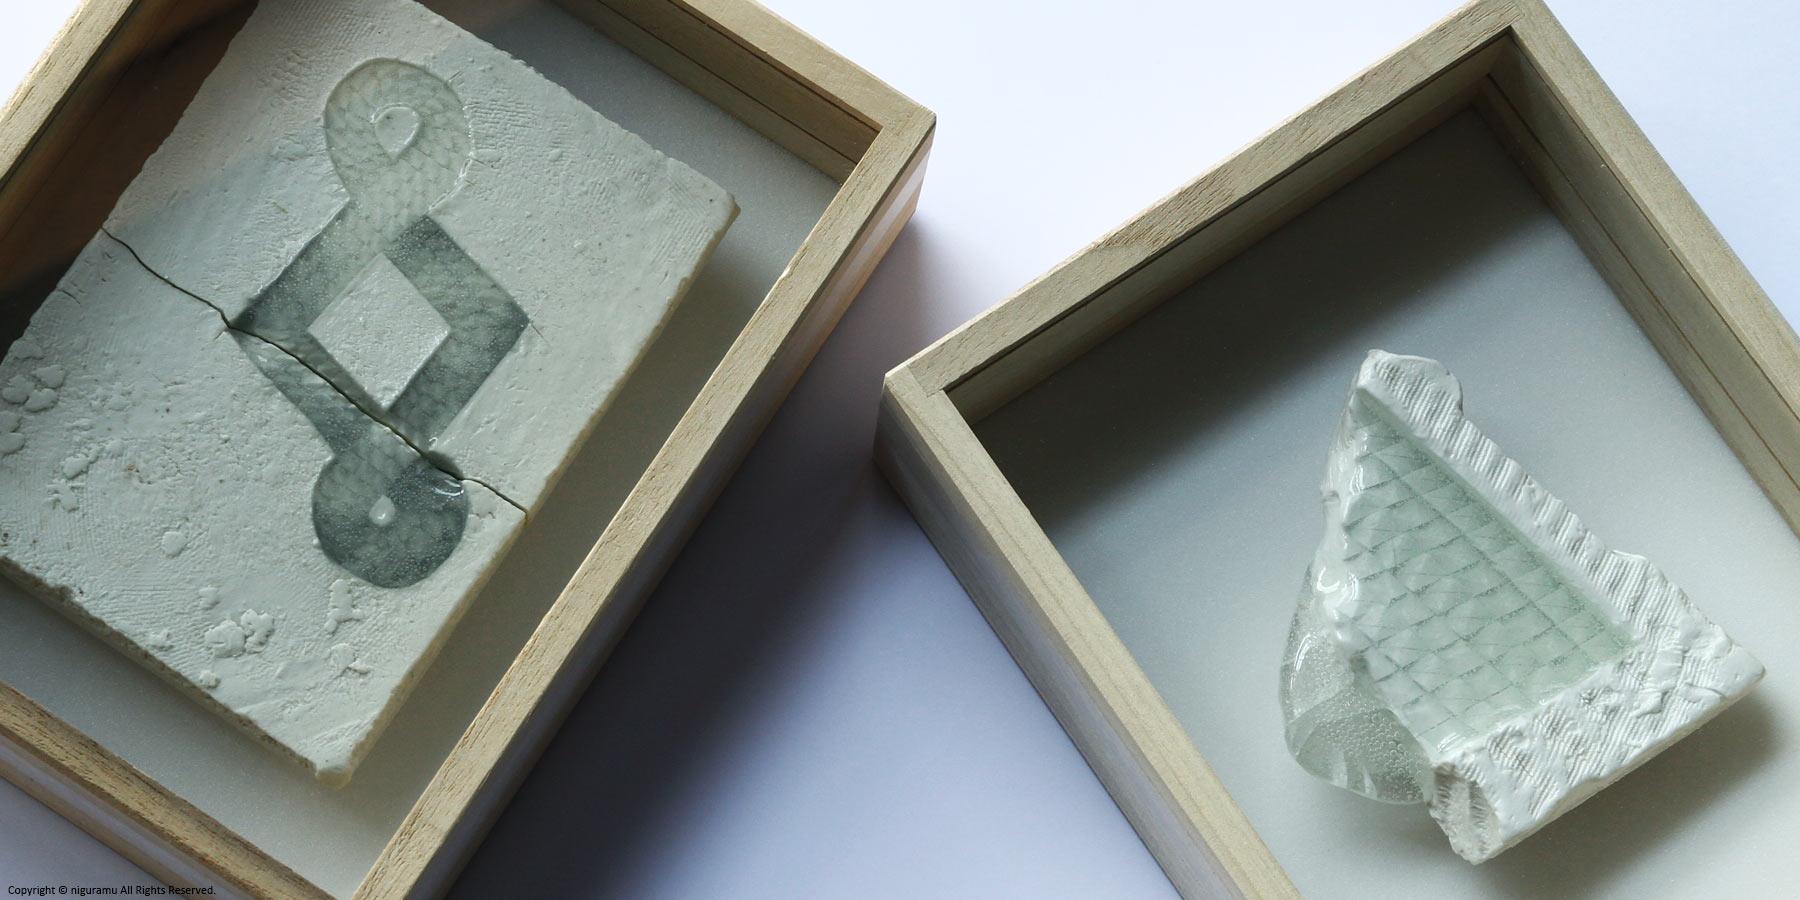 UU ceramic jewelry and objects